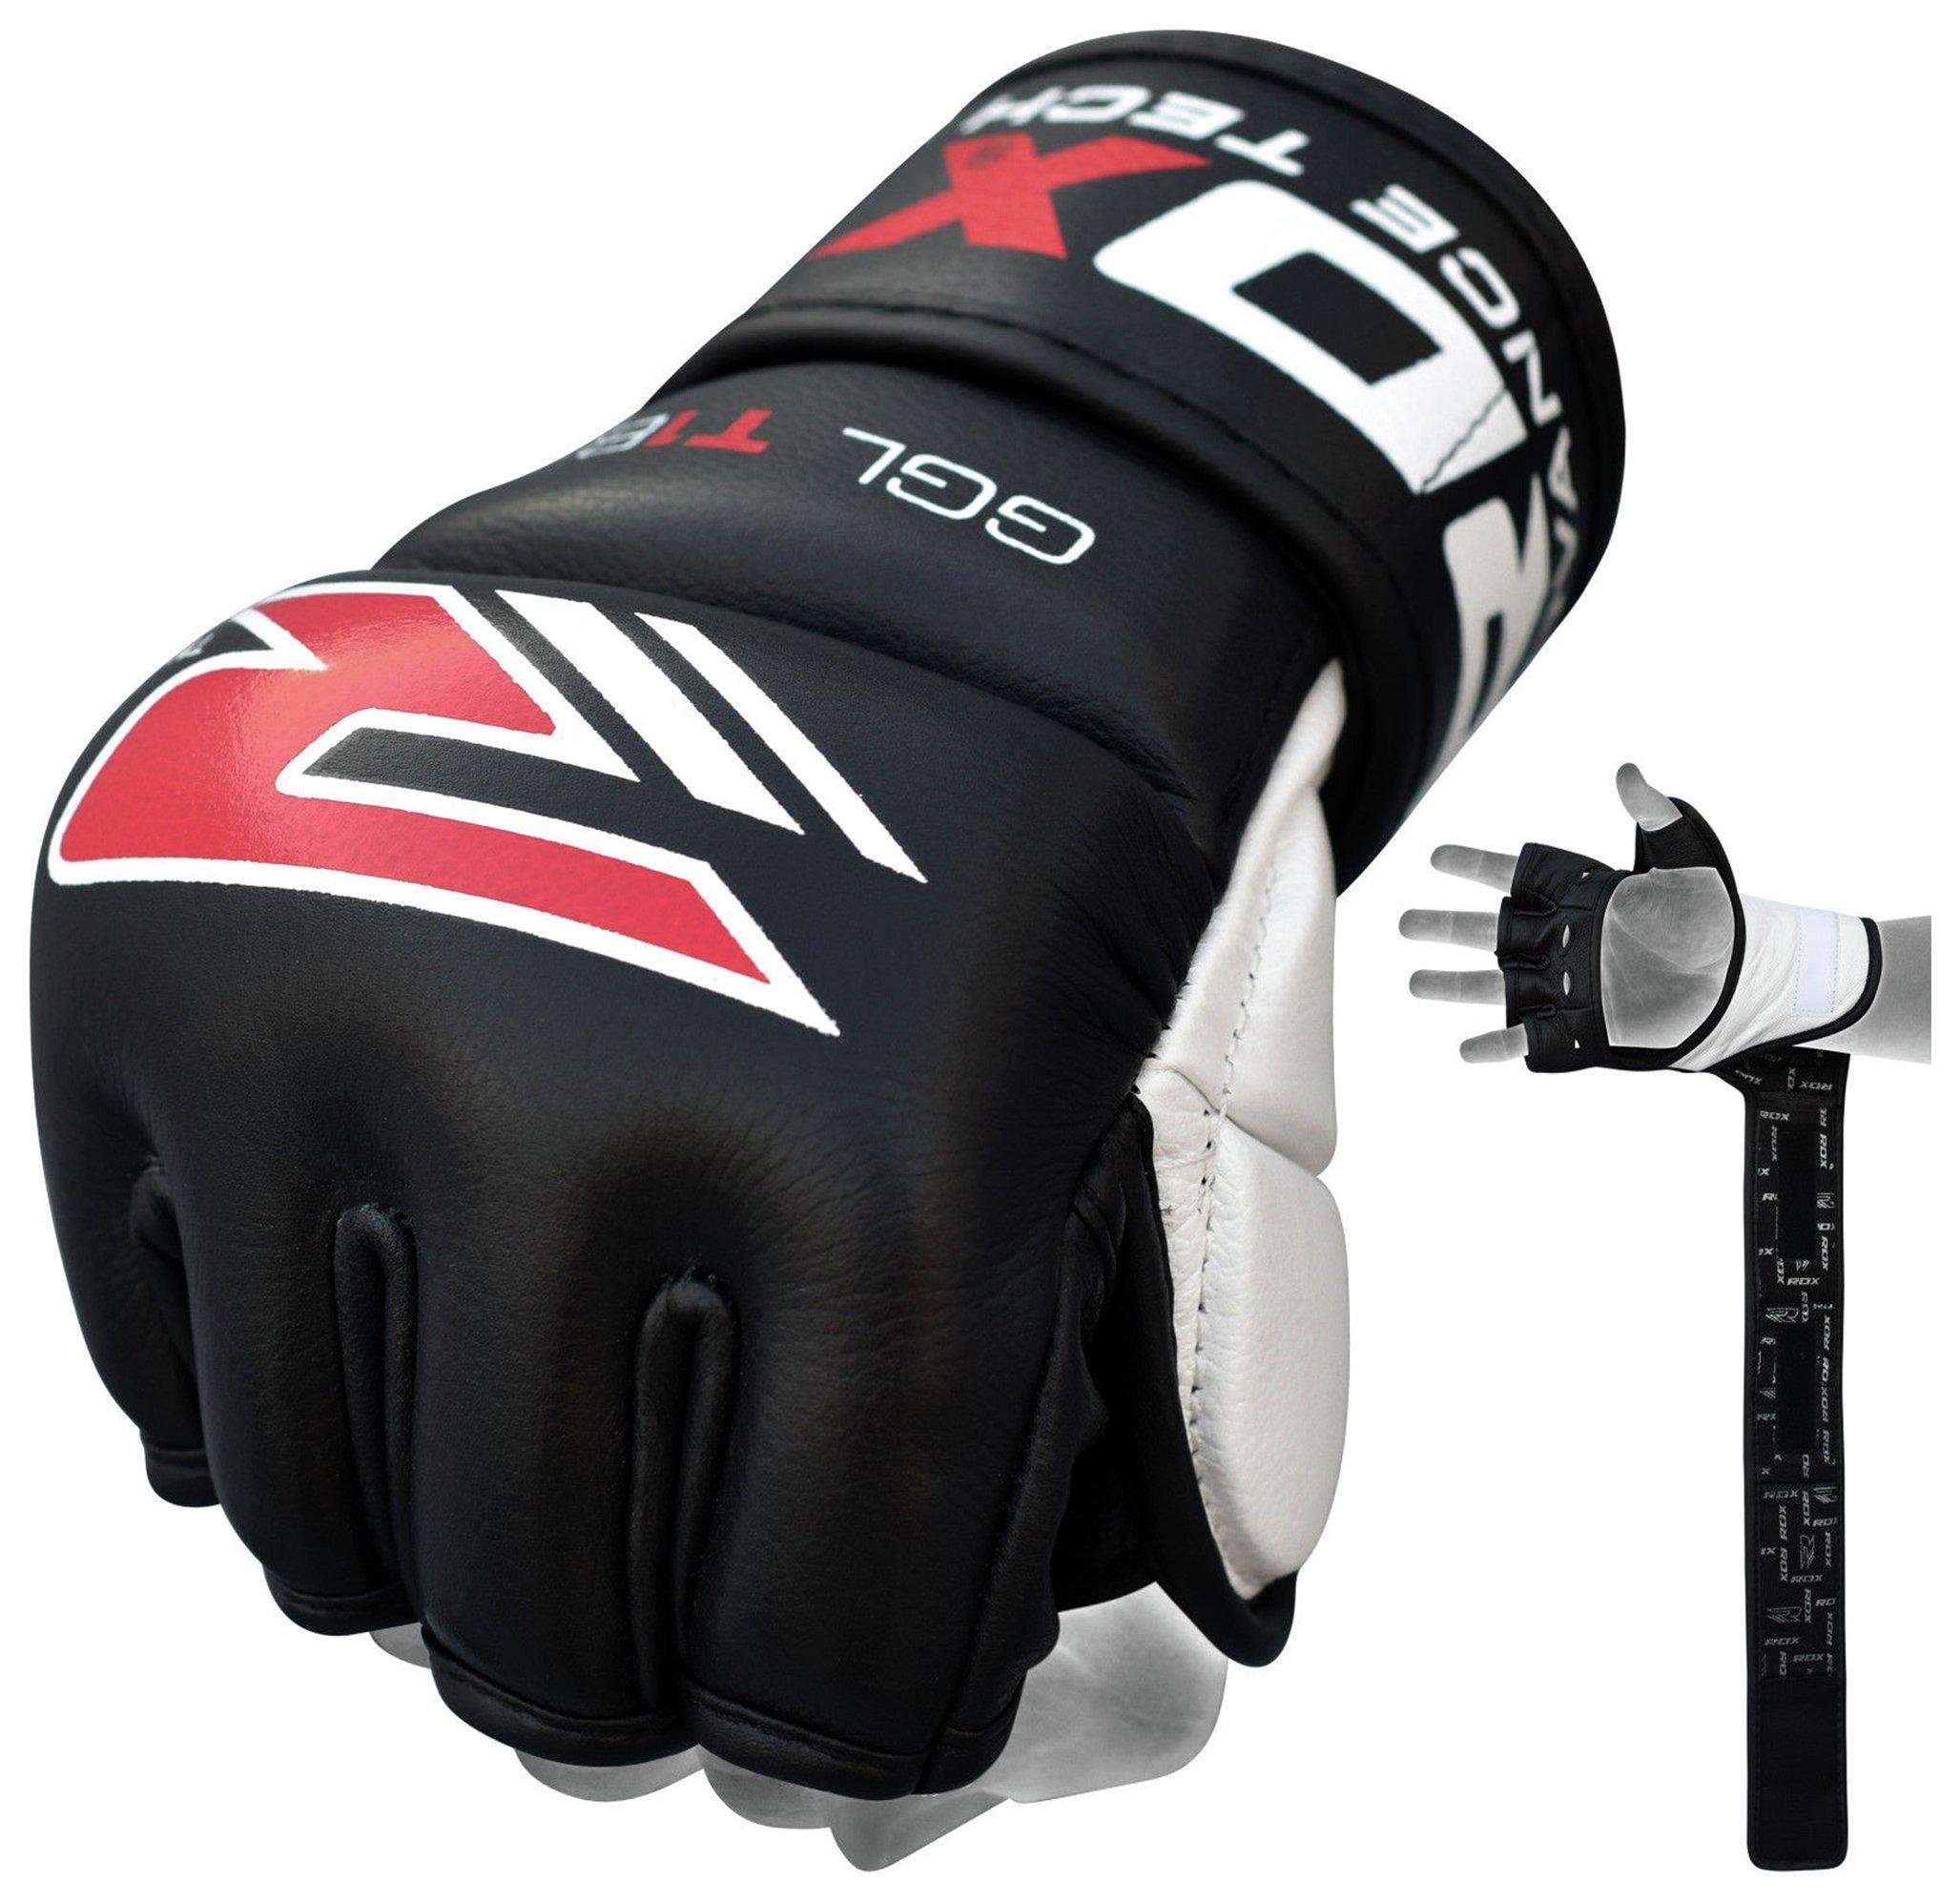 RDX Leather 7oz Mixed Martial Arts Gloves - Black.